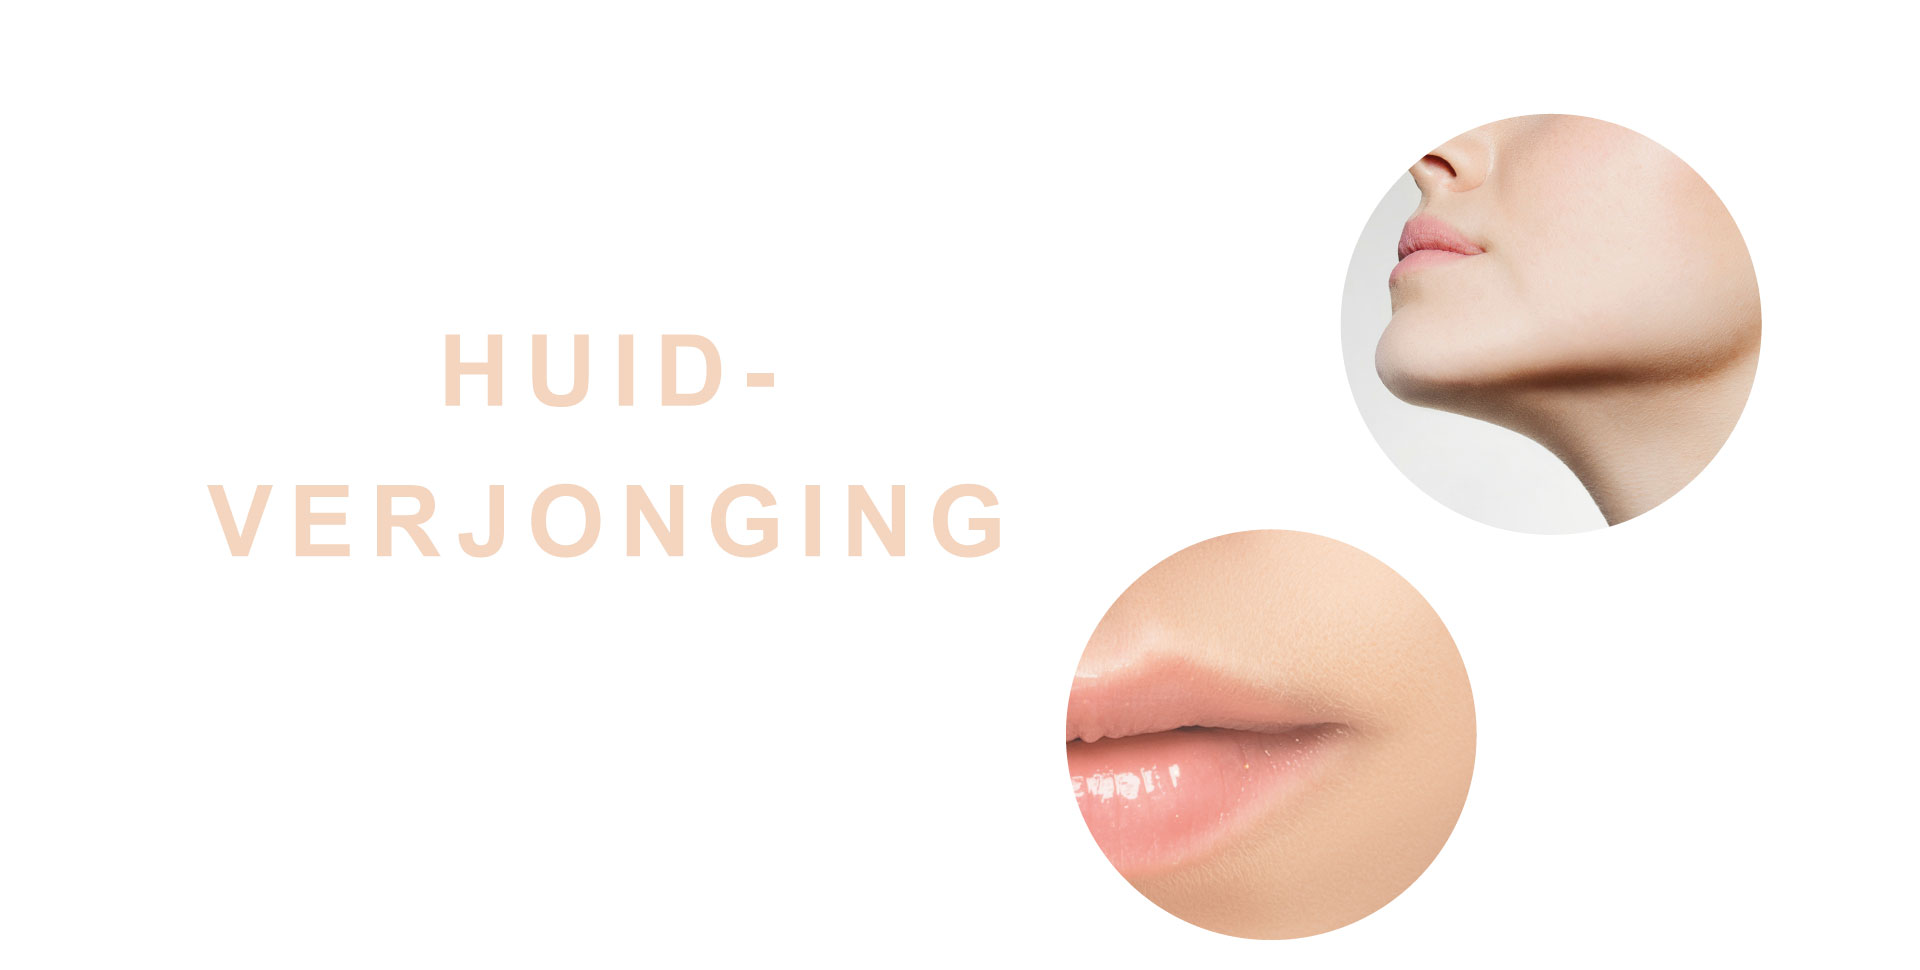 vejronging-botox-microneedling-fillers-isabelle-skincare-schoonheidsspecialiste-tessenderlo